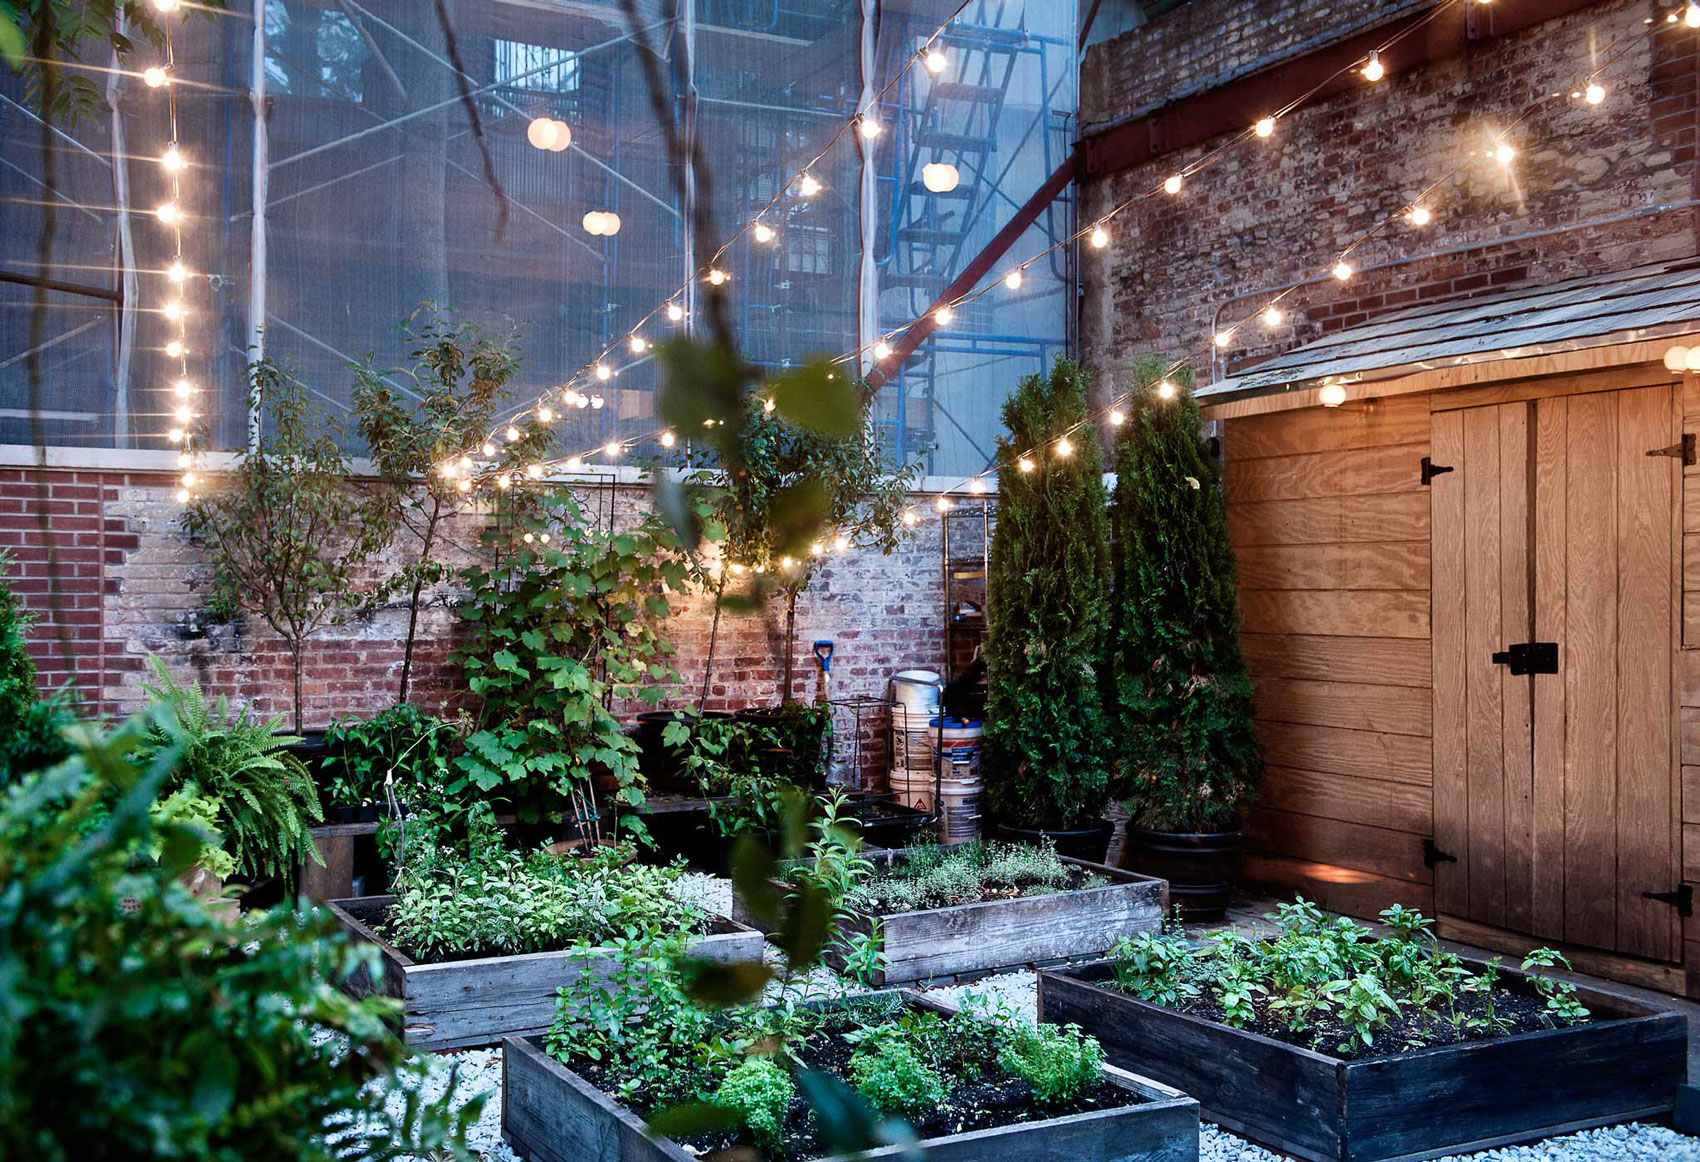 The chef's herb garden